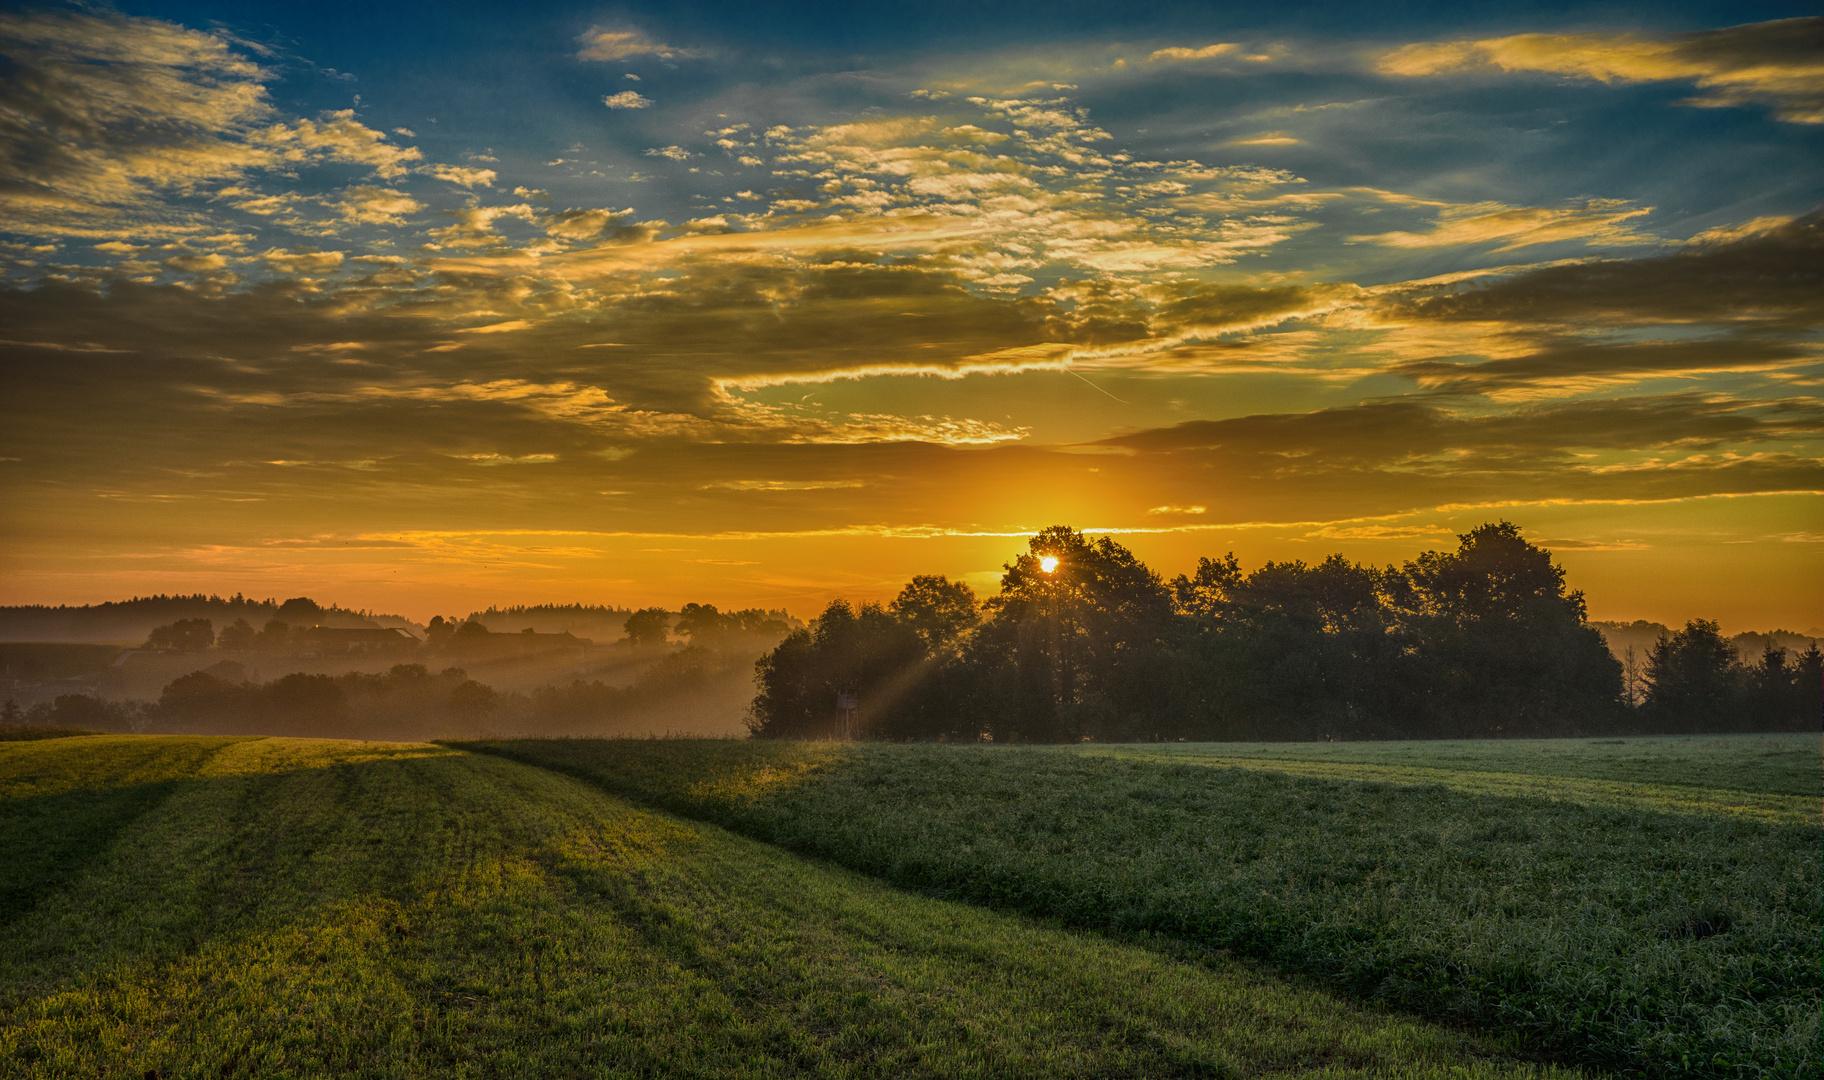 Morning Beam